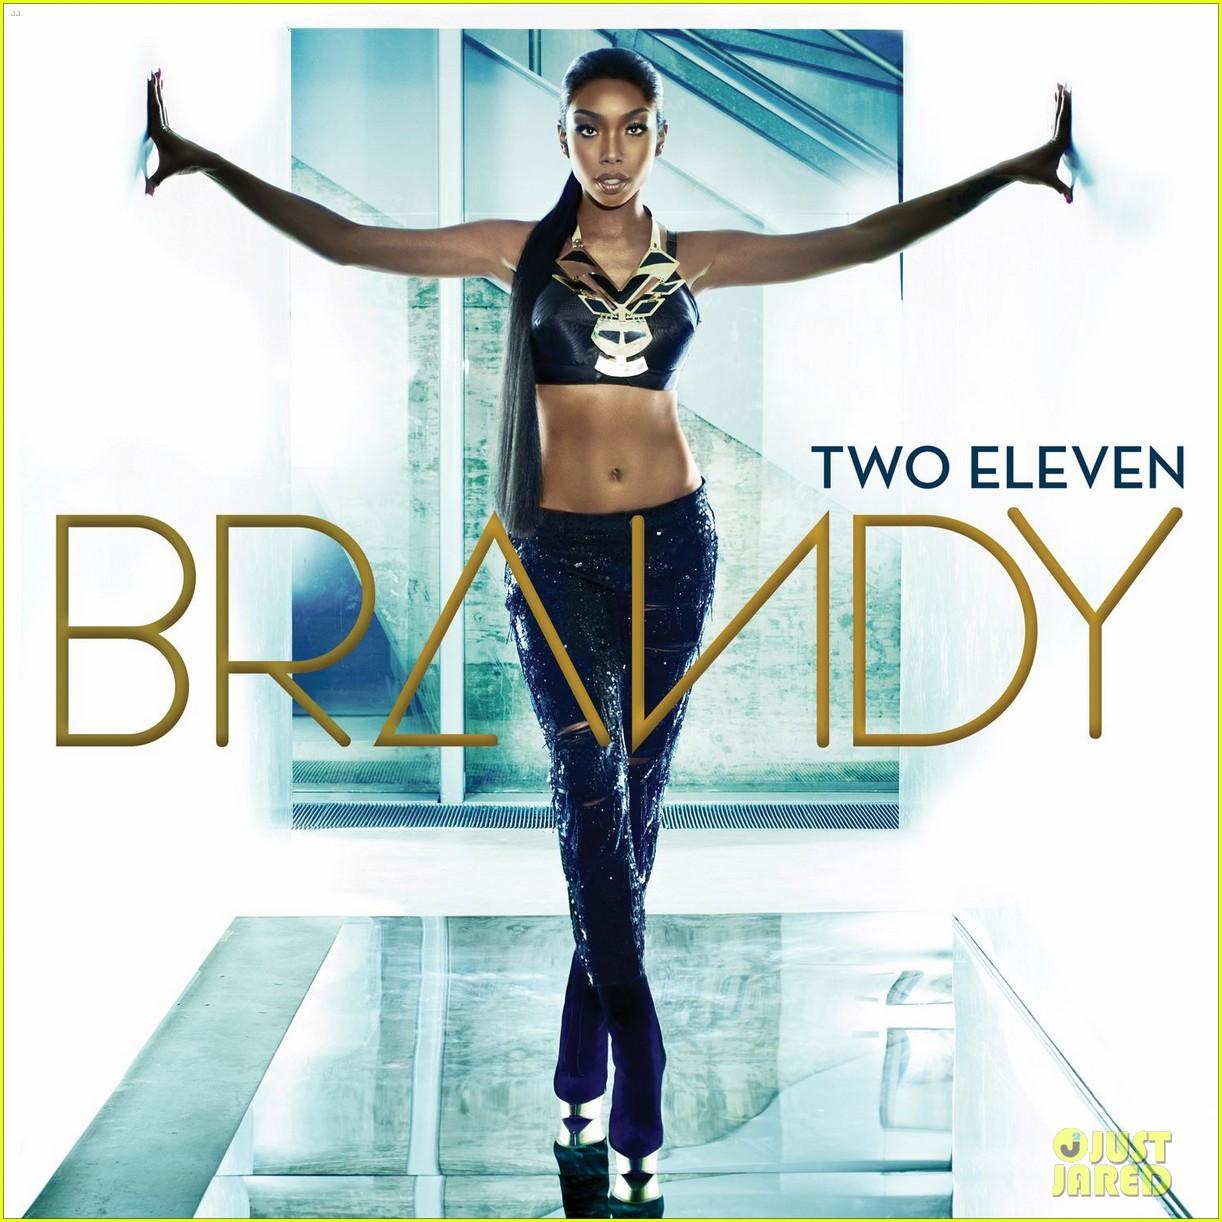 brandy two eleven album cover artwork revealed2711575